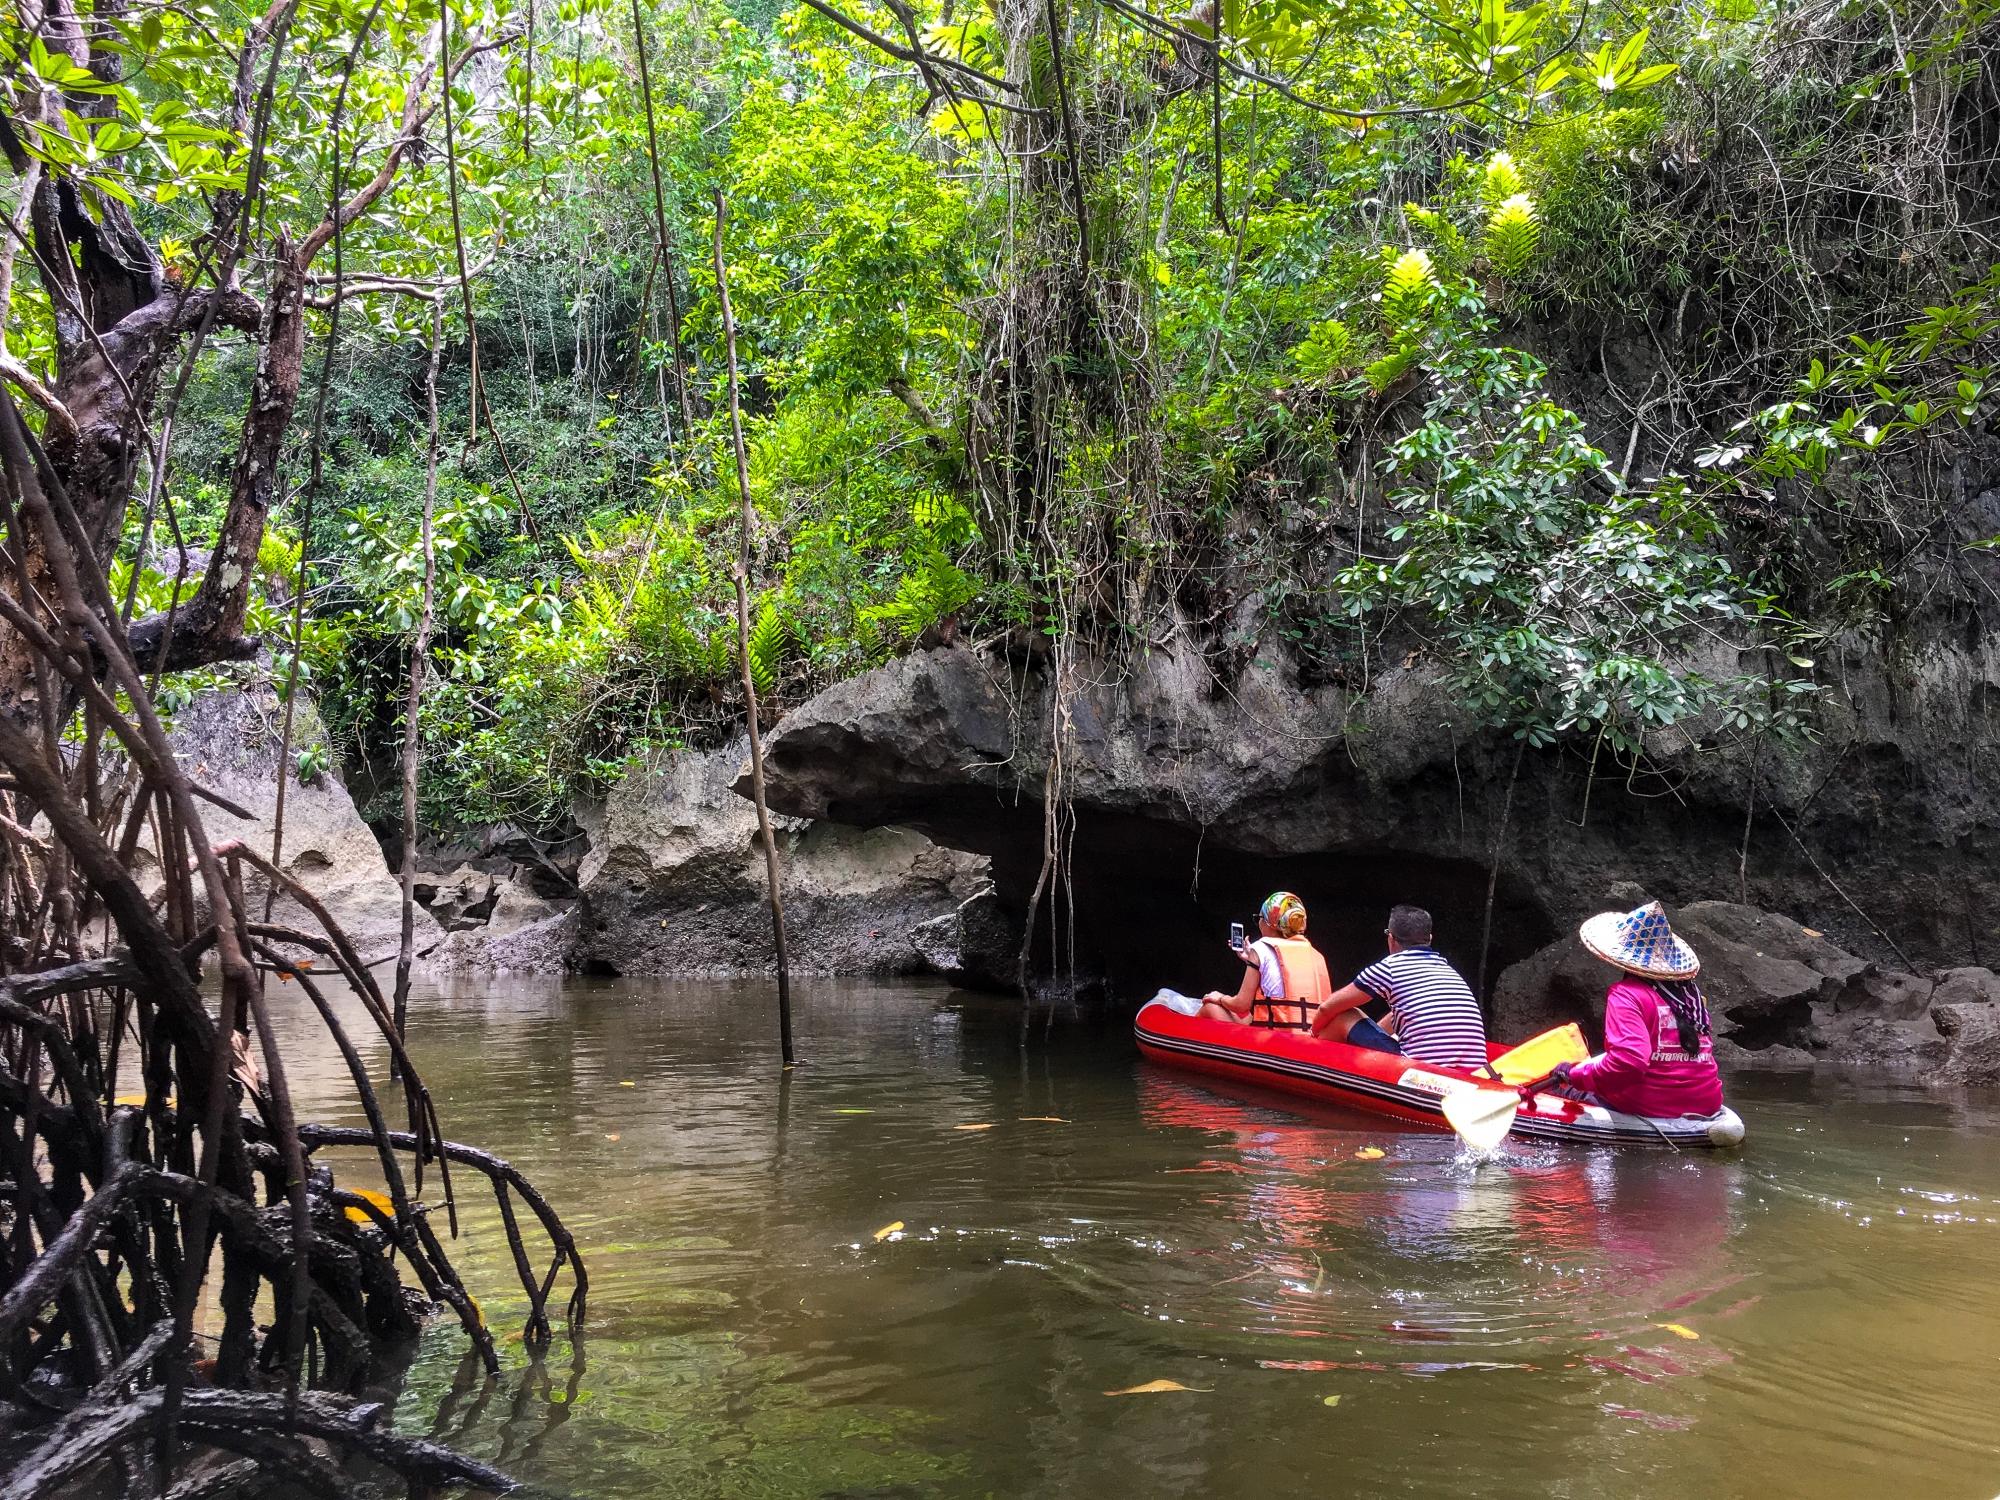 The Mangrove Swamp And Mangrove Cave In Phang Nga Bay